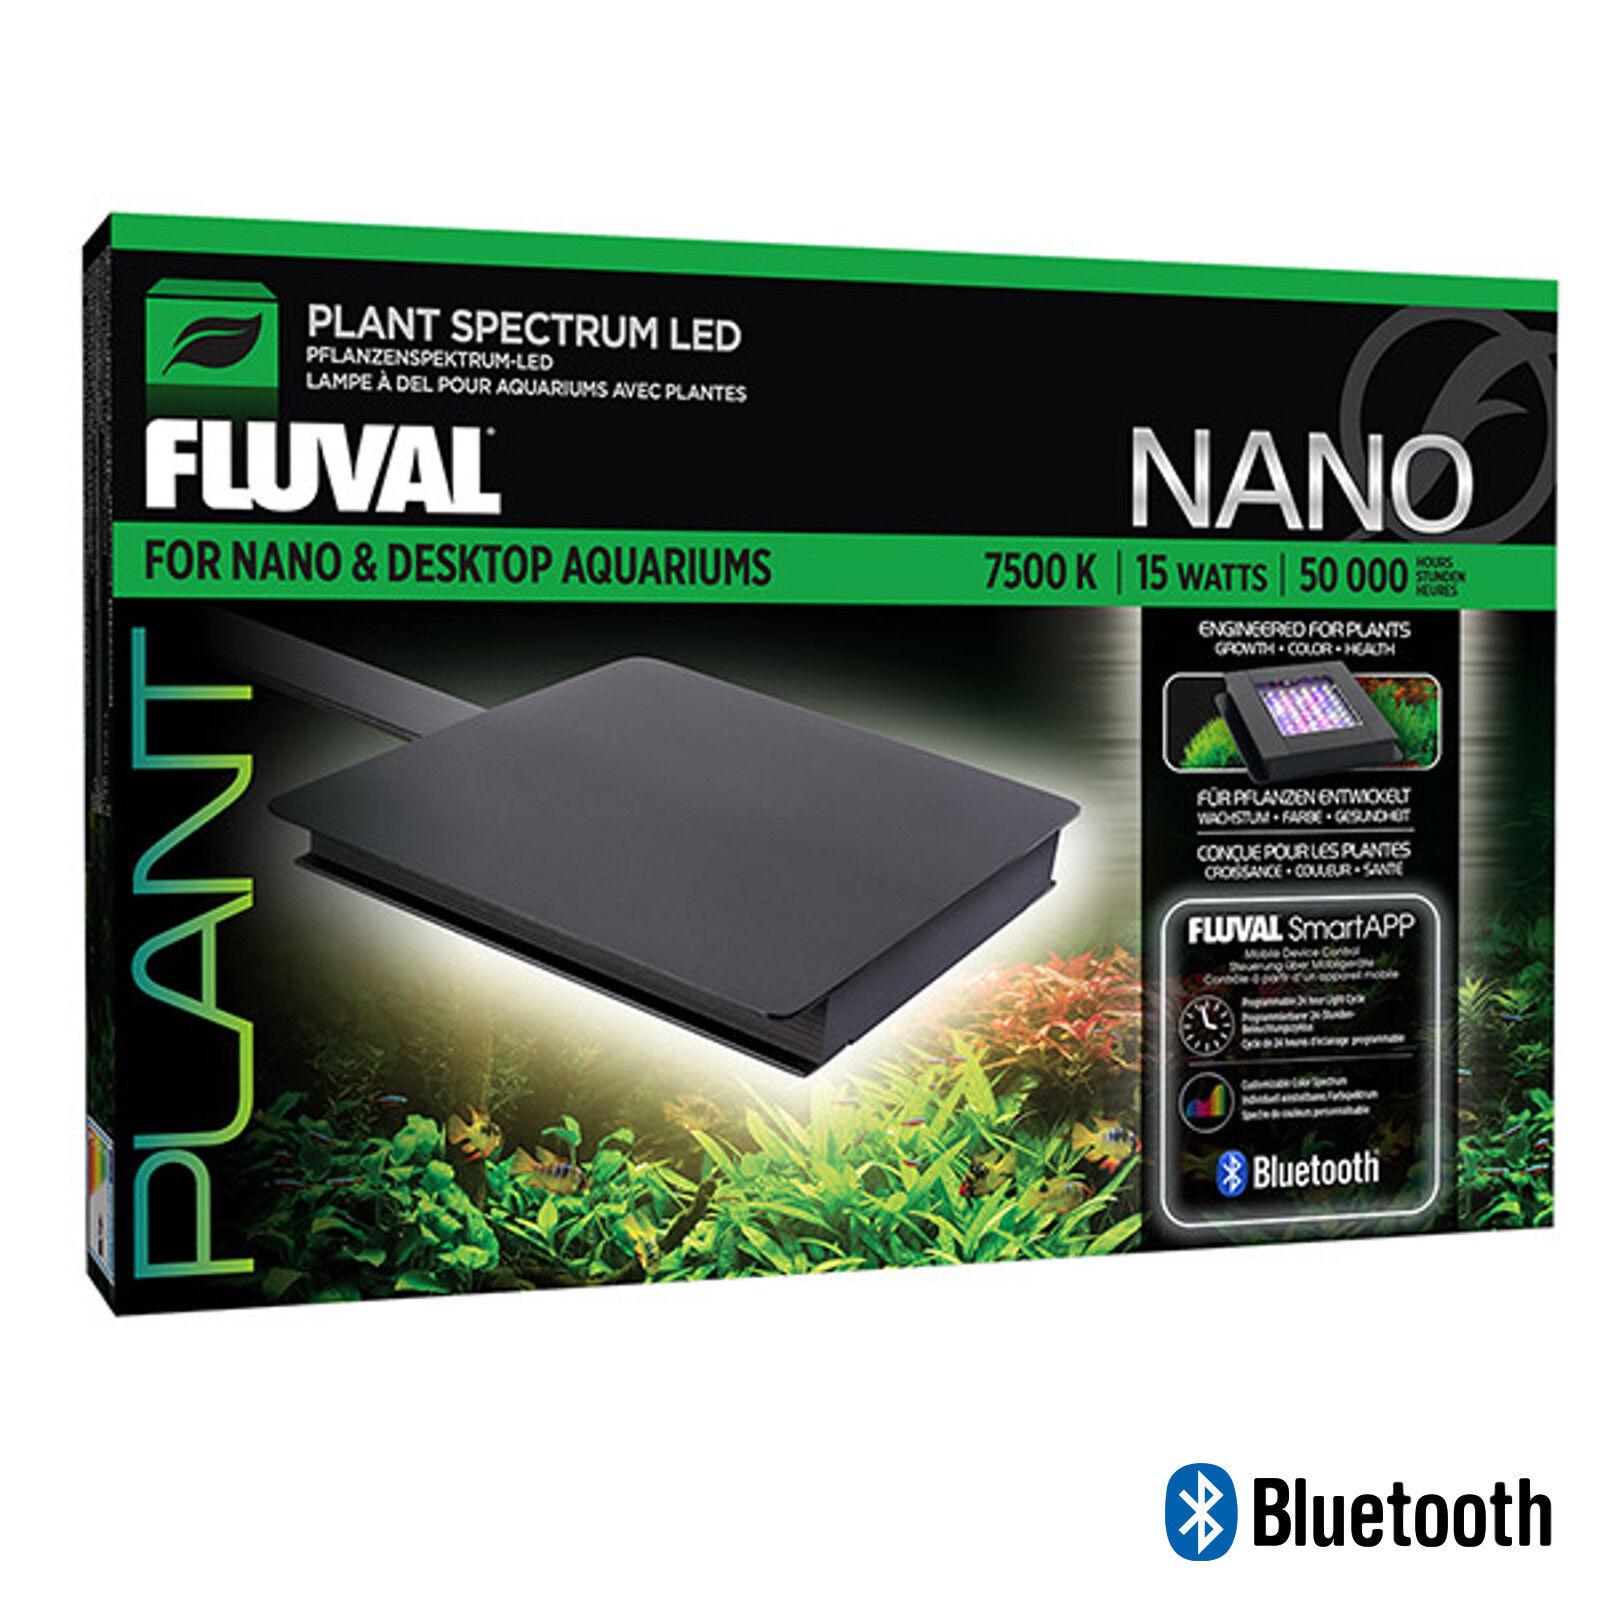 NUOVO IMPIANTO FLUVAL Nano Bluetooth LED 15W 12.7 x 12.7cm